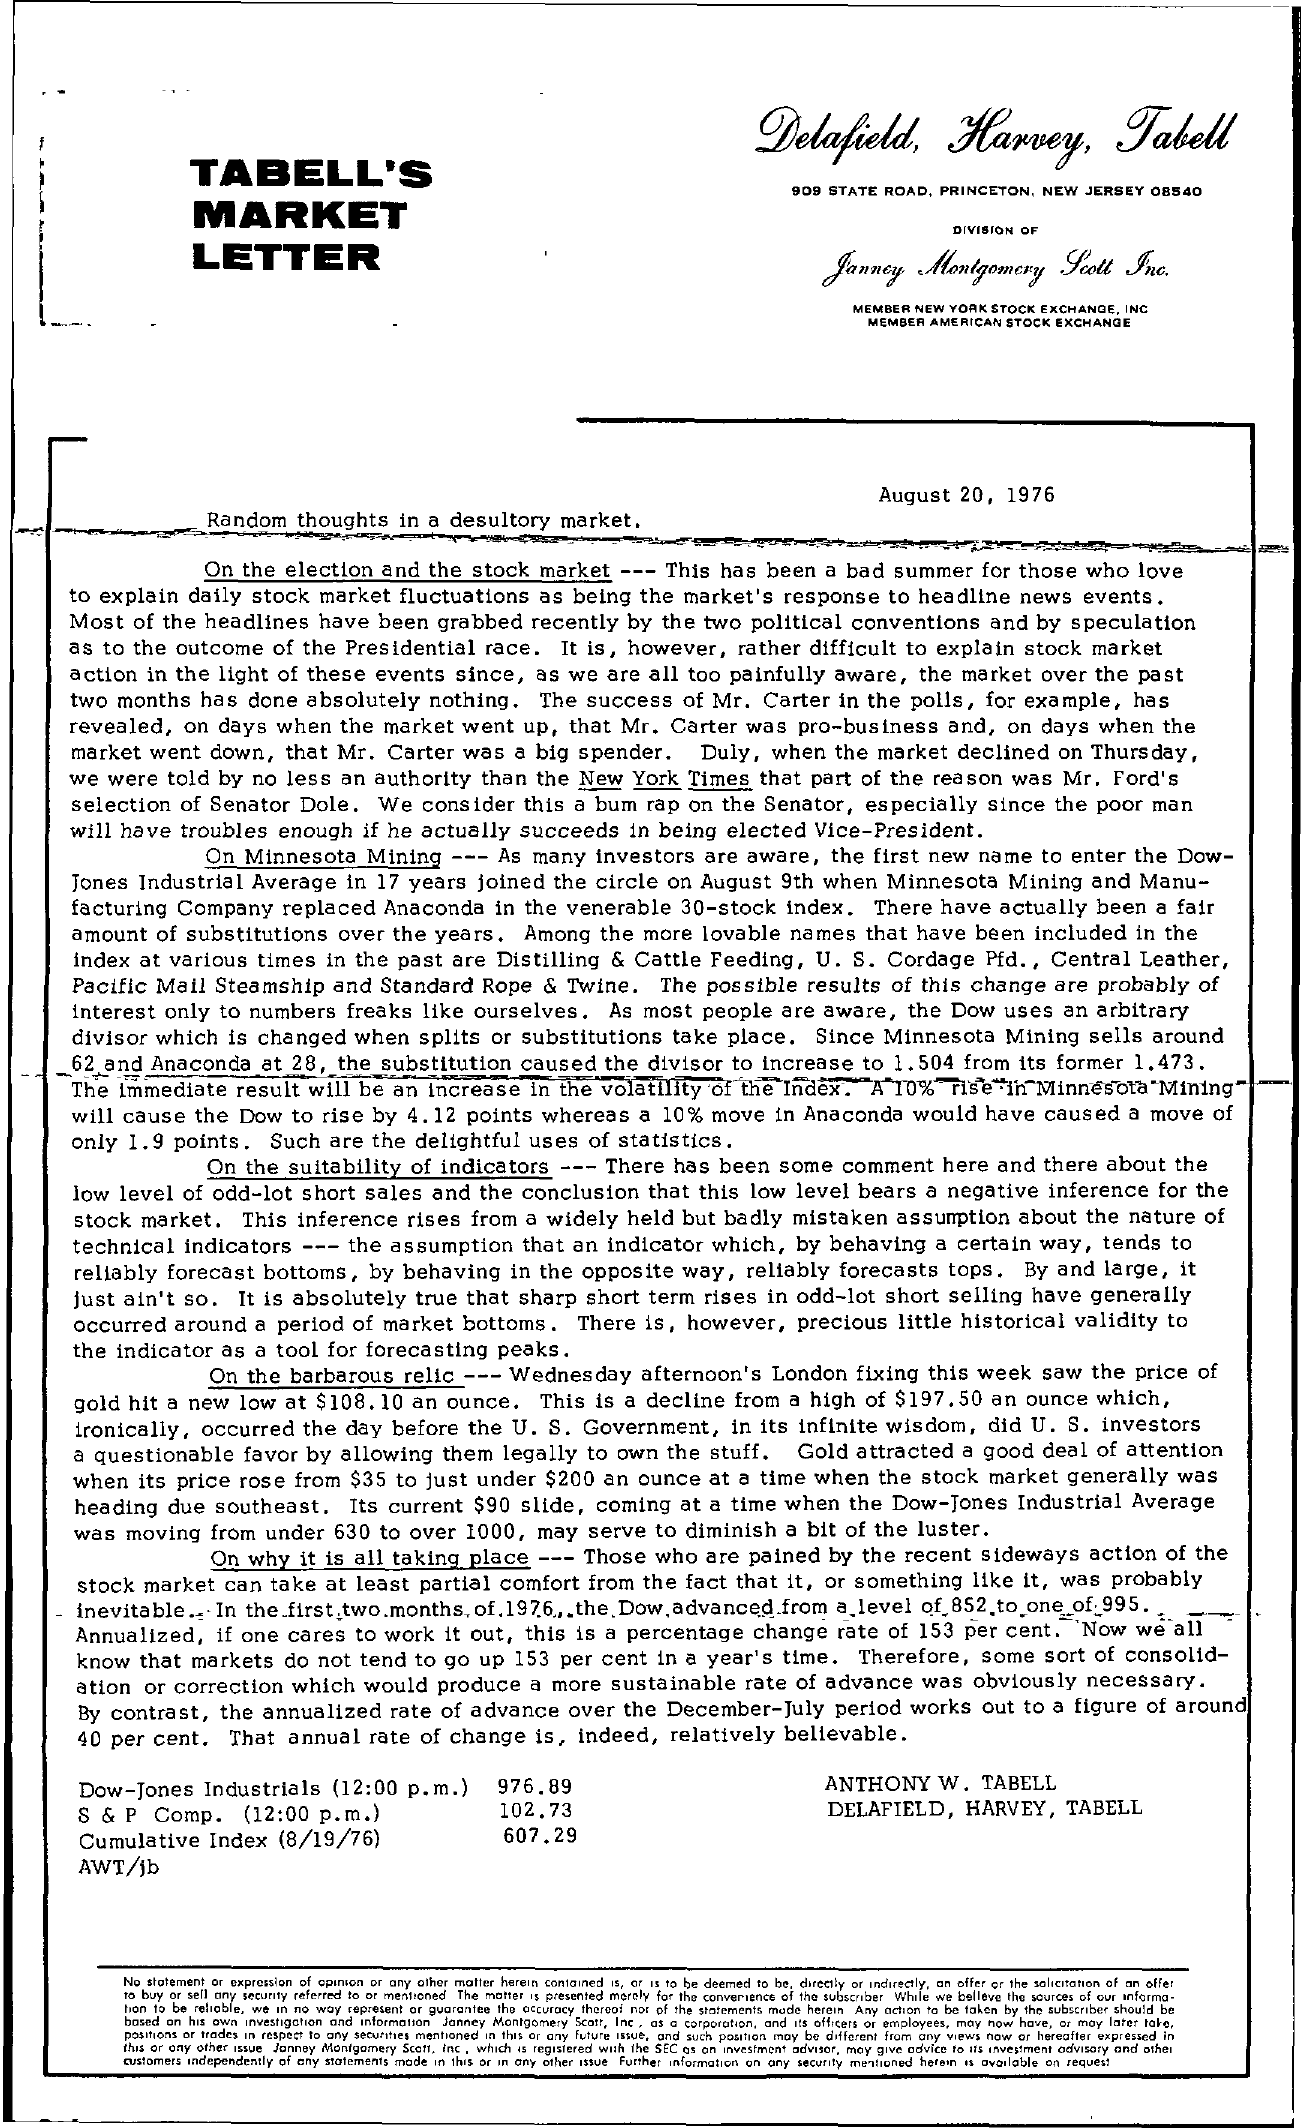 Tabell's Market Letter - August 20, 1976